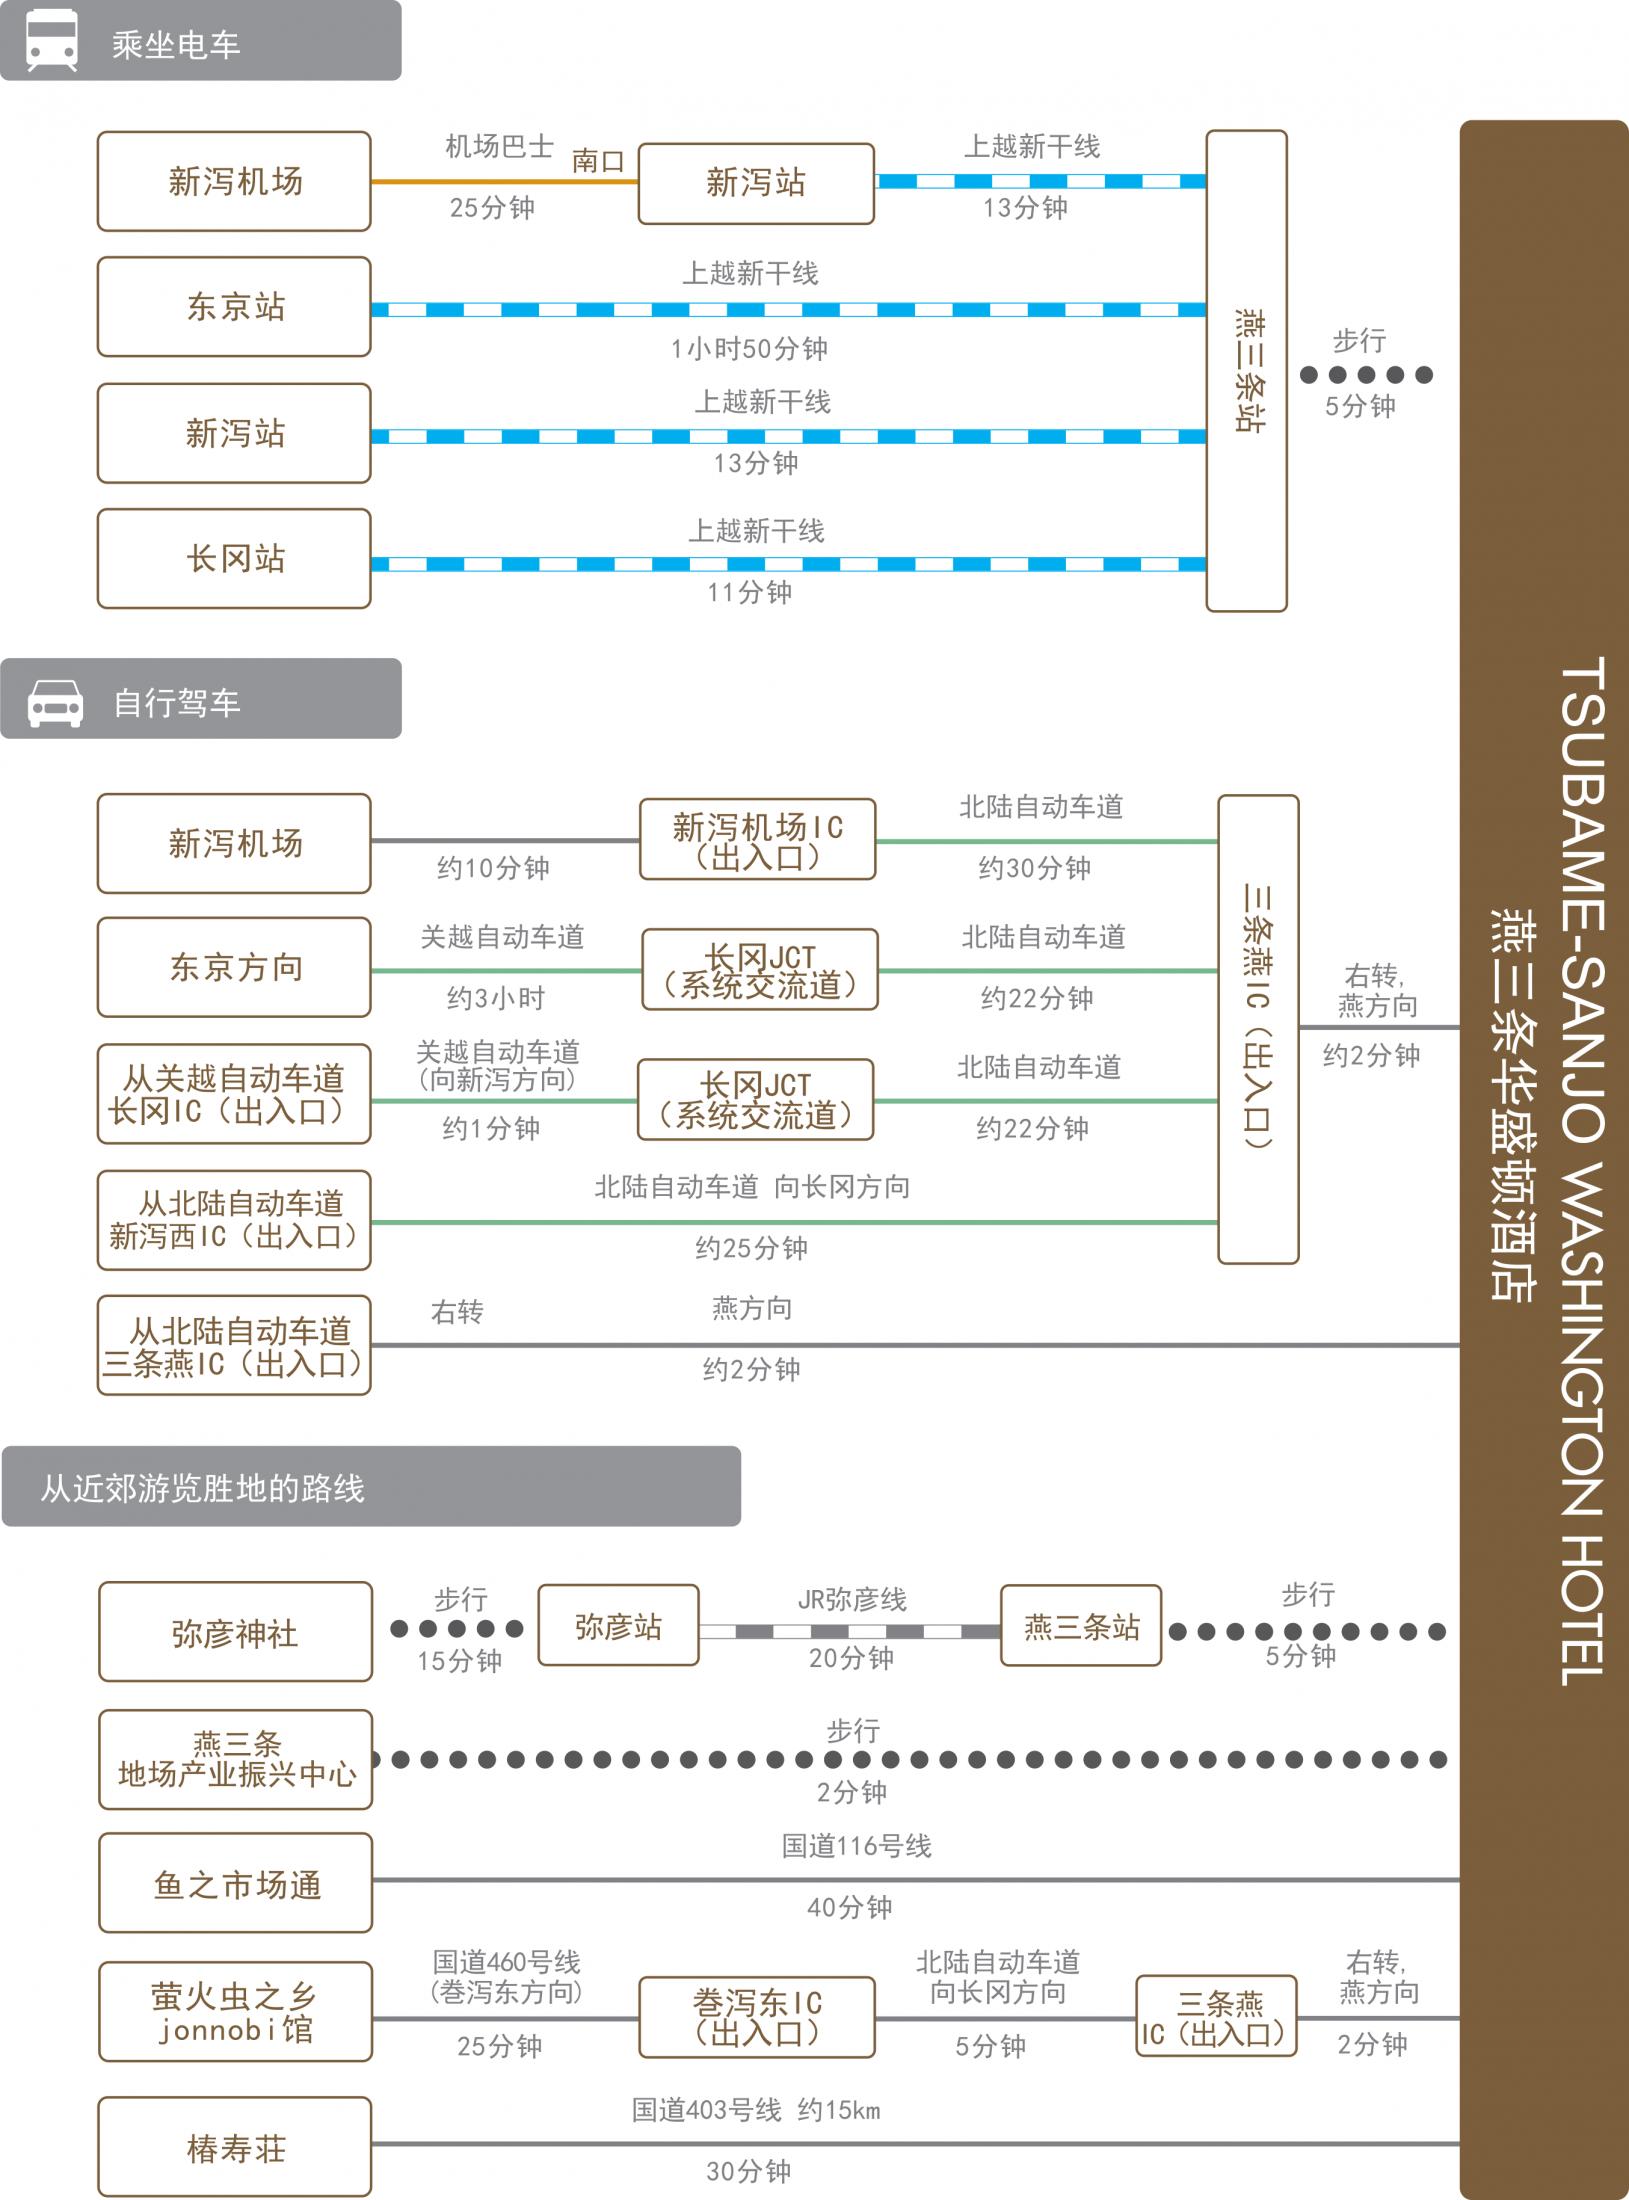 chart_zh-cn_tsubame-snjo_wh